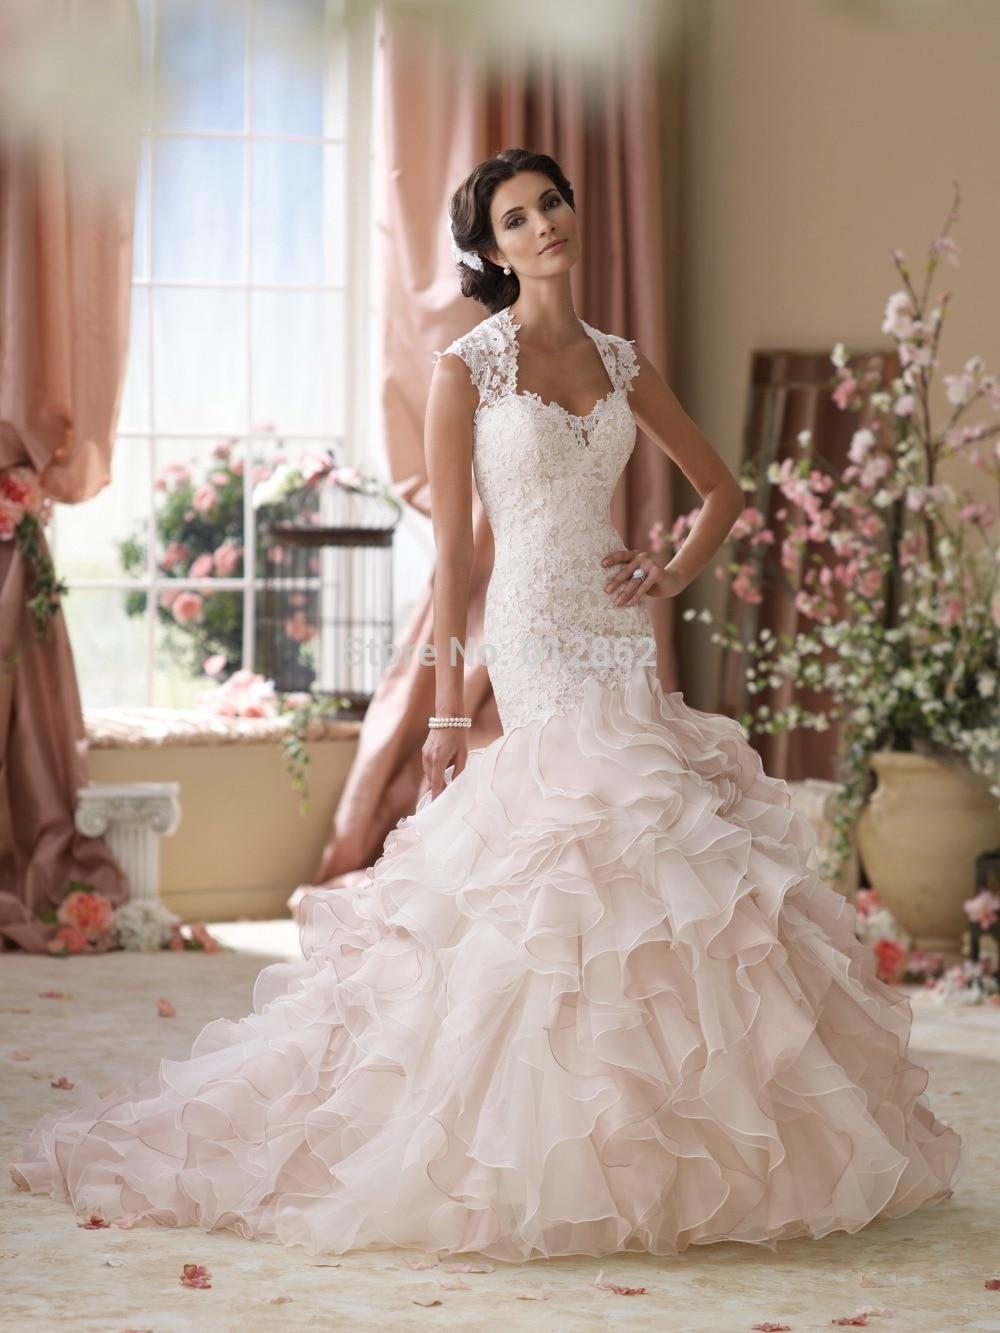 blush pink wedding dress blush colored wedding dresses Eva Lendel bridal sheer cap sleeves sheer jewel neck sweetheart neckline heavily embellished bodice blush color romantic a line wedding dress open v